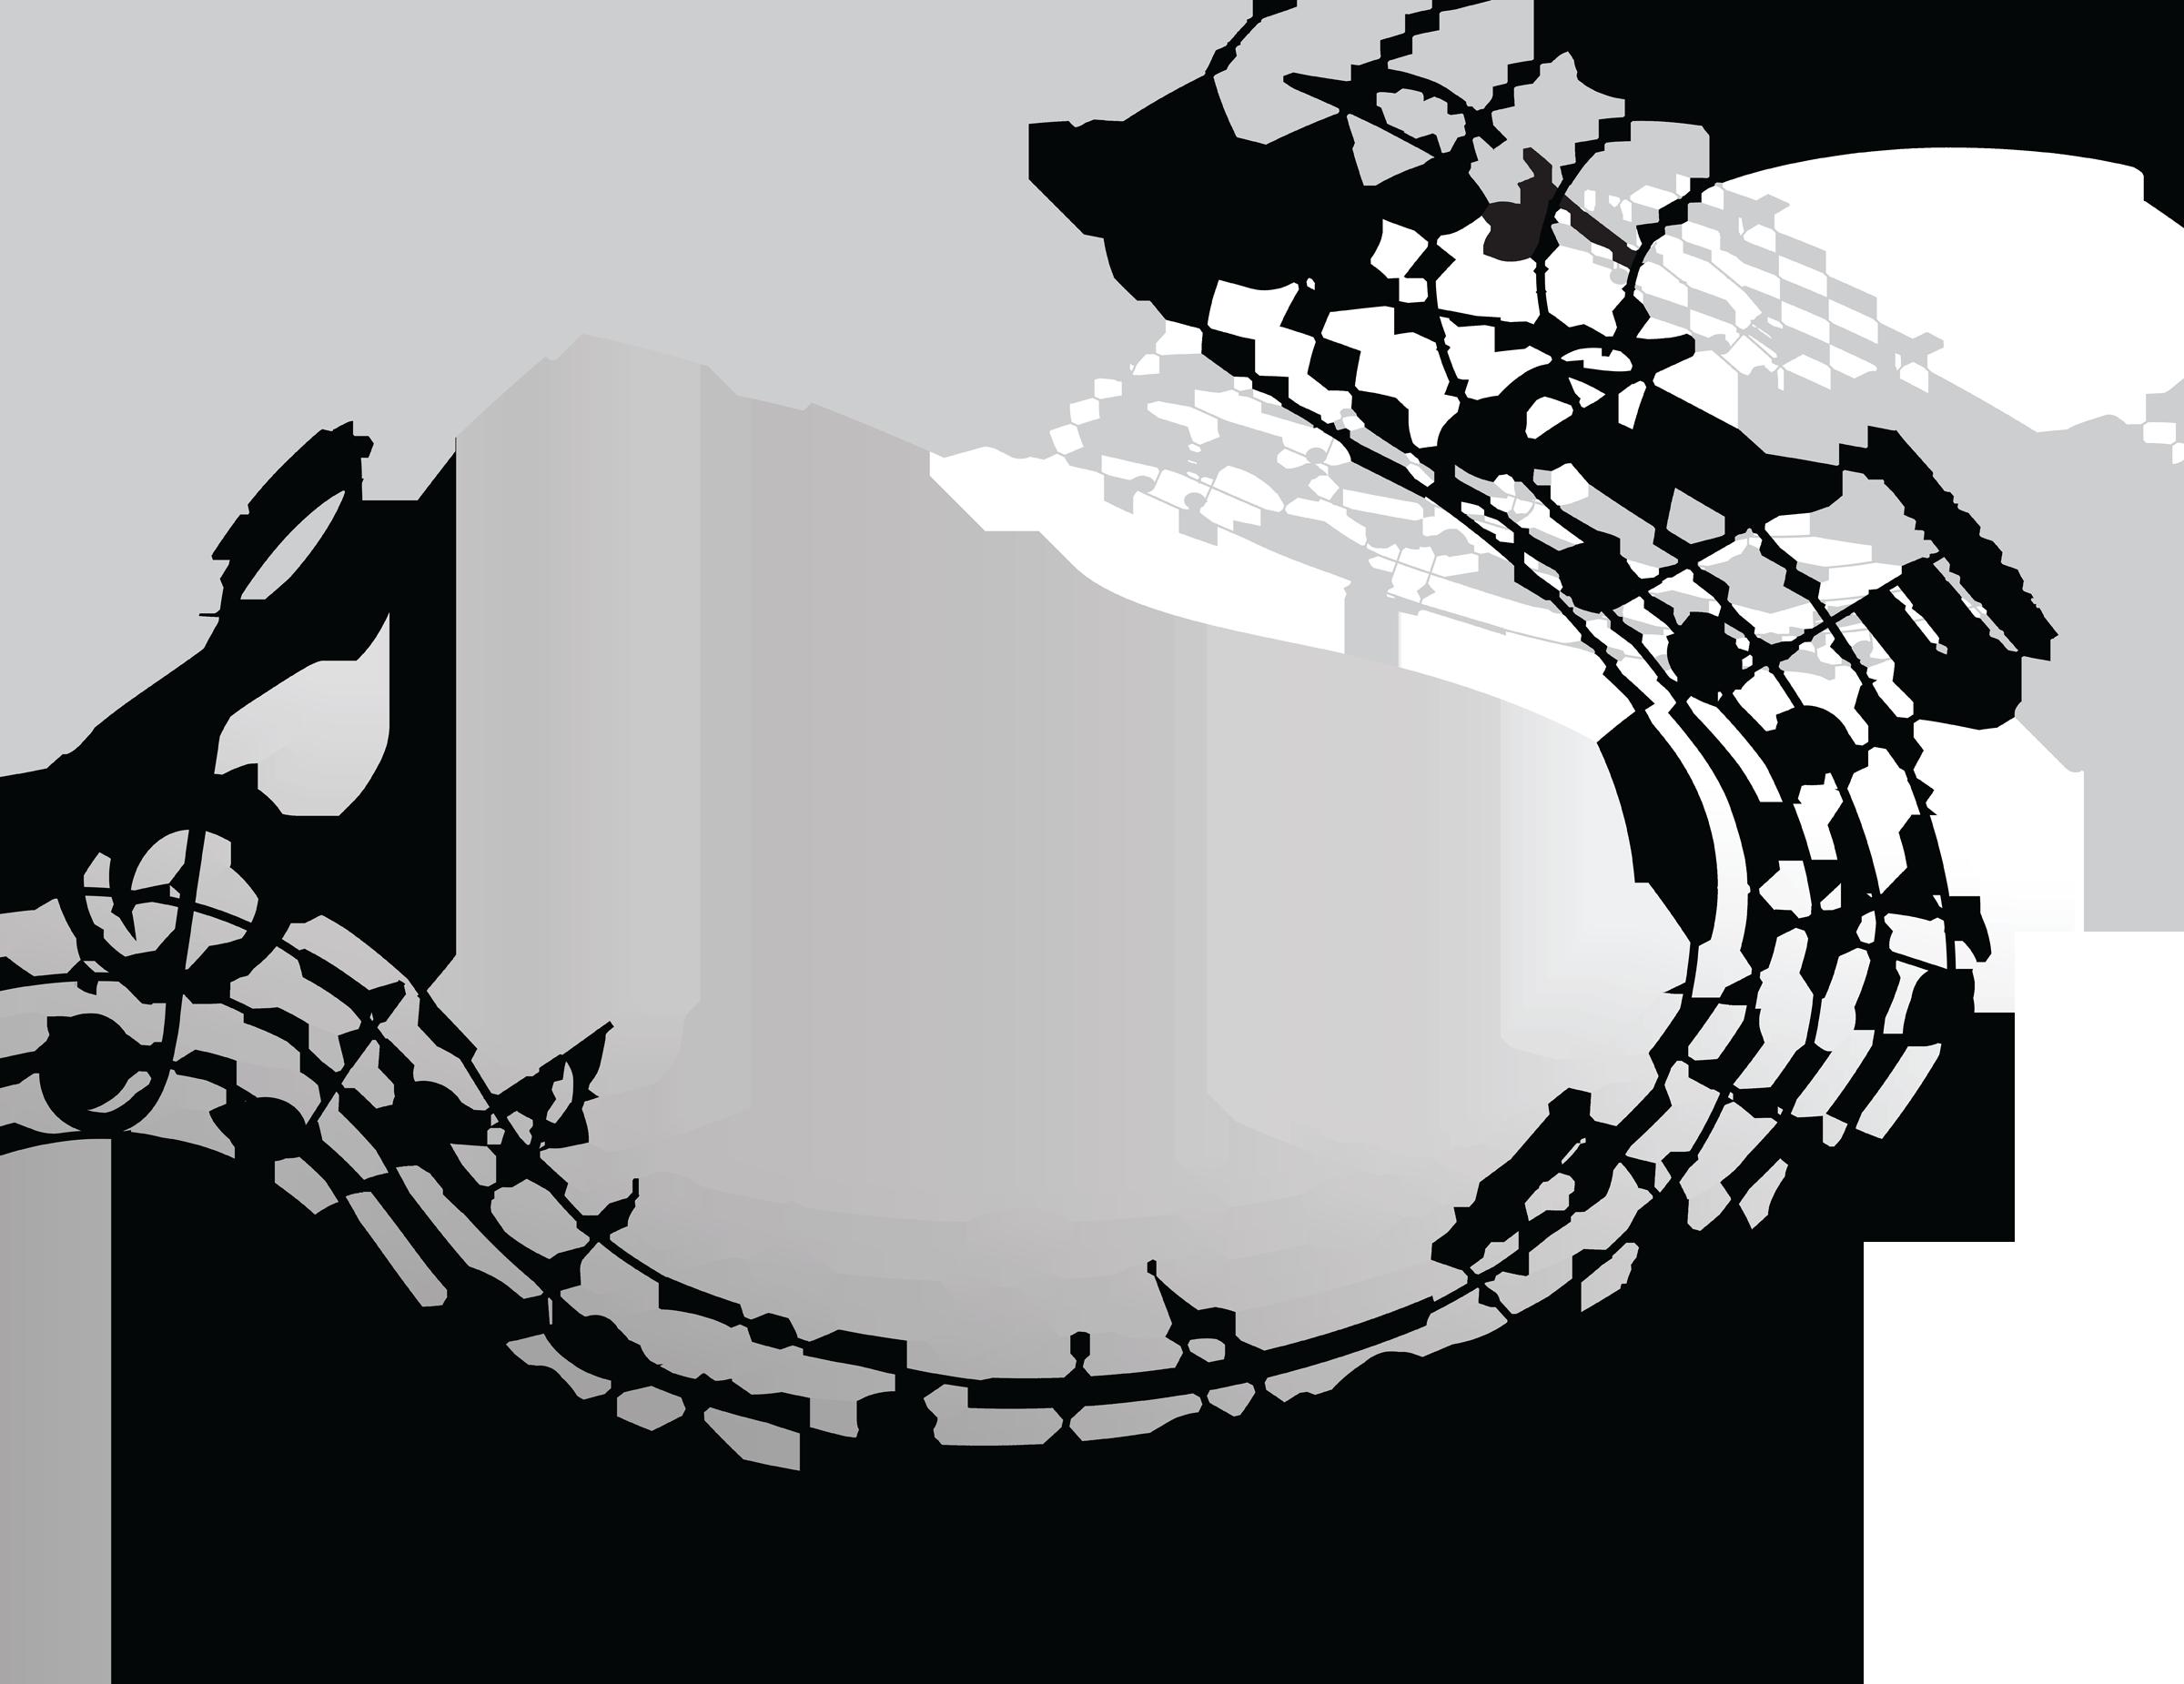 Music Png Transparent Image - Music, Transparent background PNG HD thumbnail